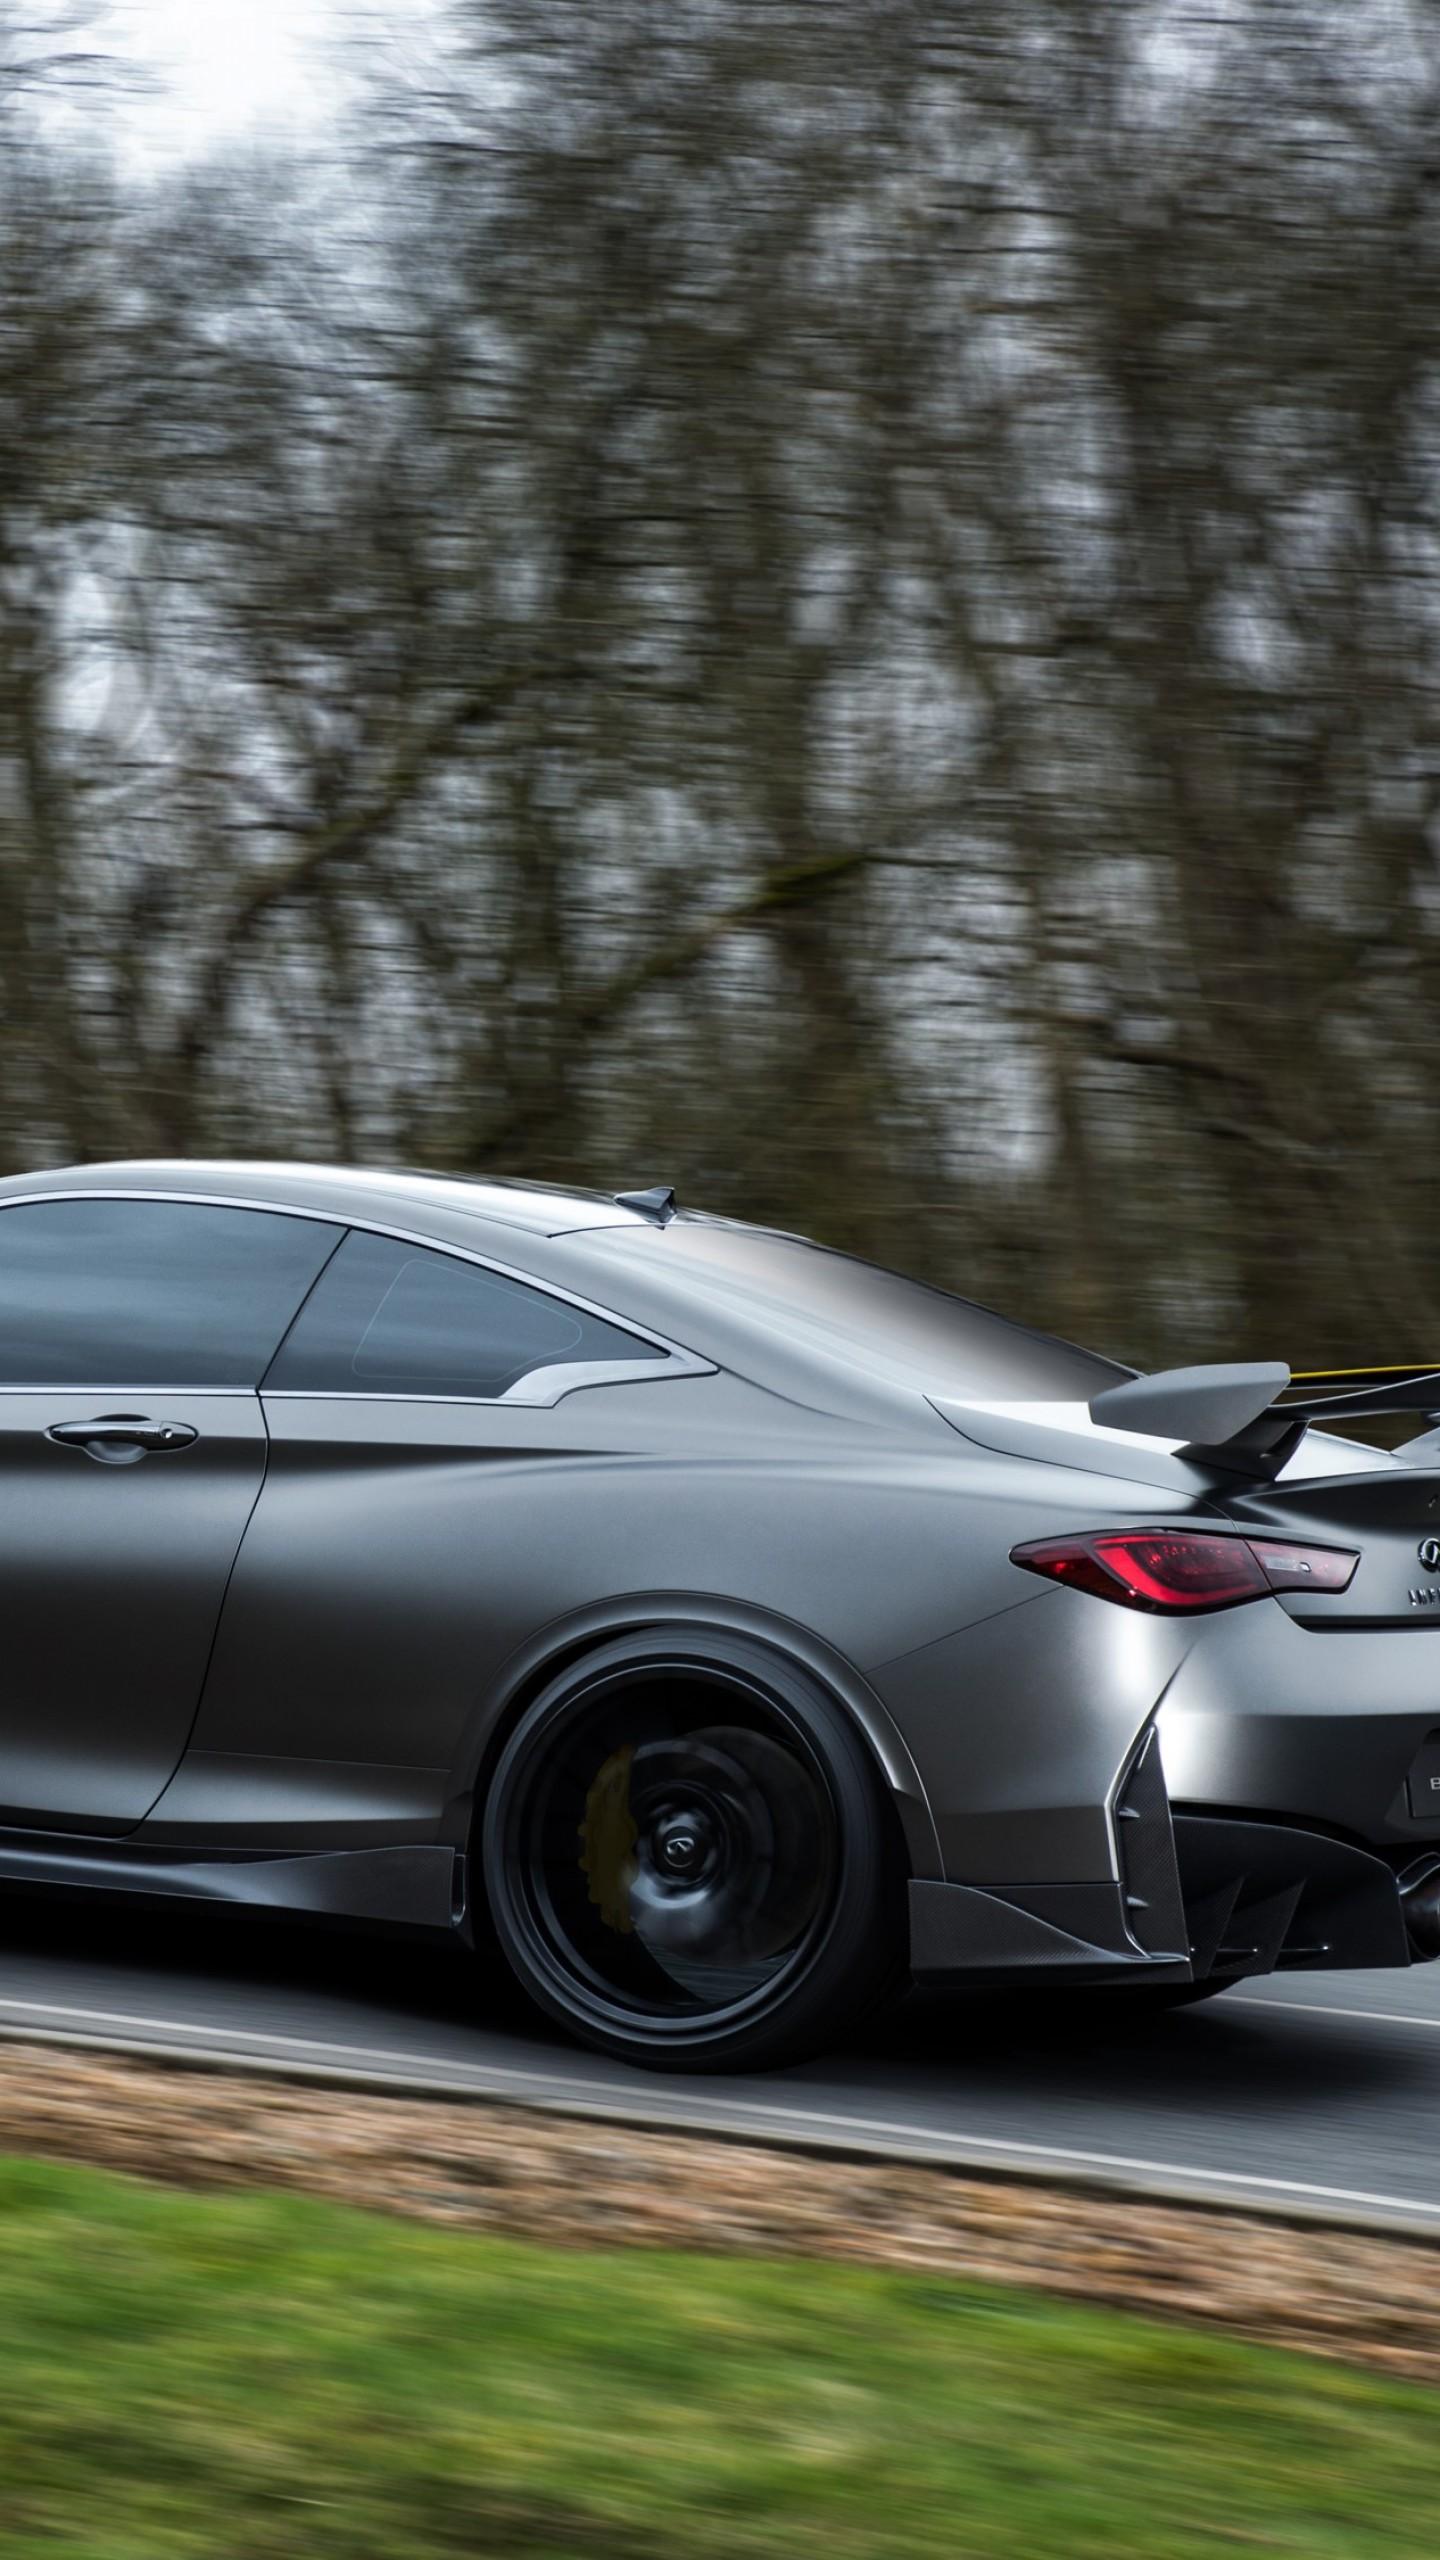 Jaguar F Type S >> Wallpaper Infiniti Q60 Project Black S, 2018 Cars, 4K, Cars & Bikes #20475